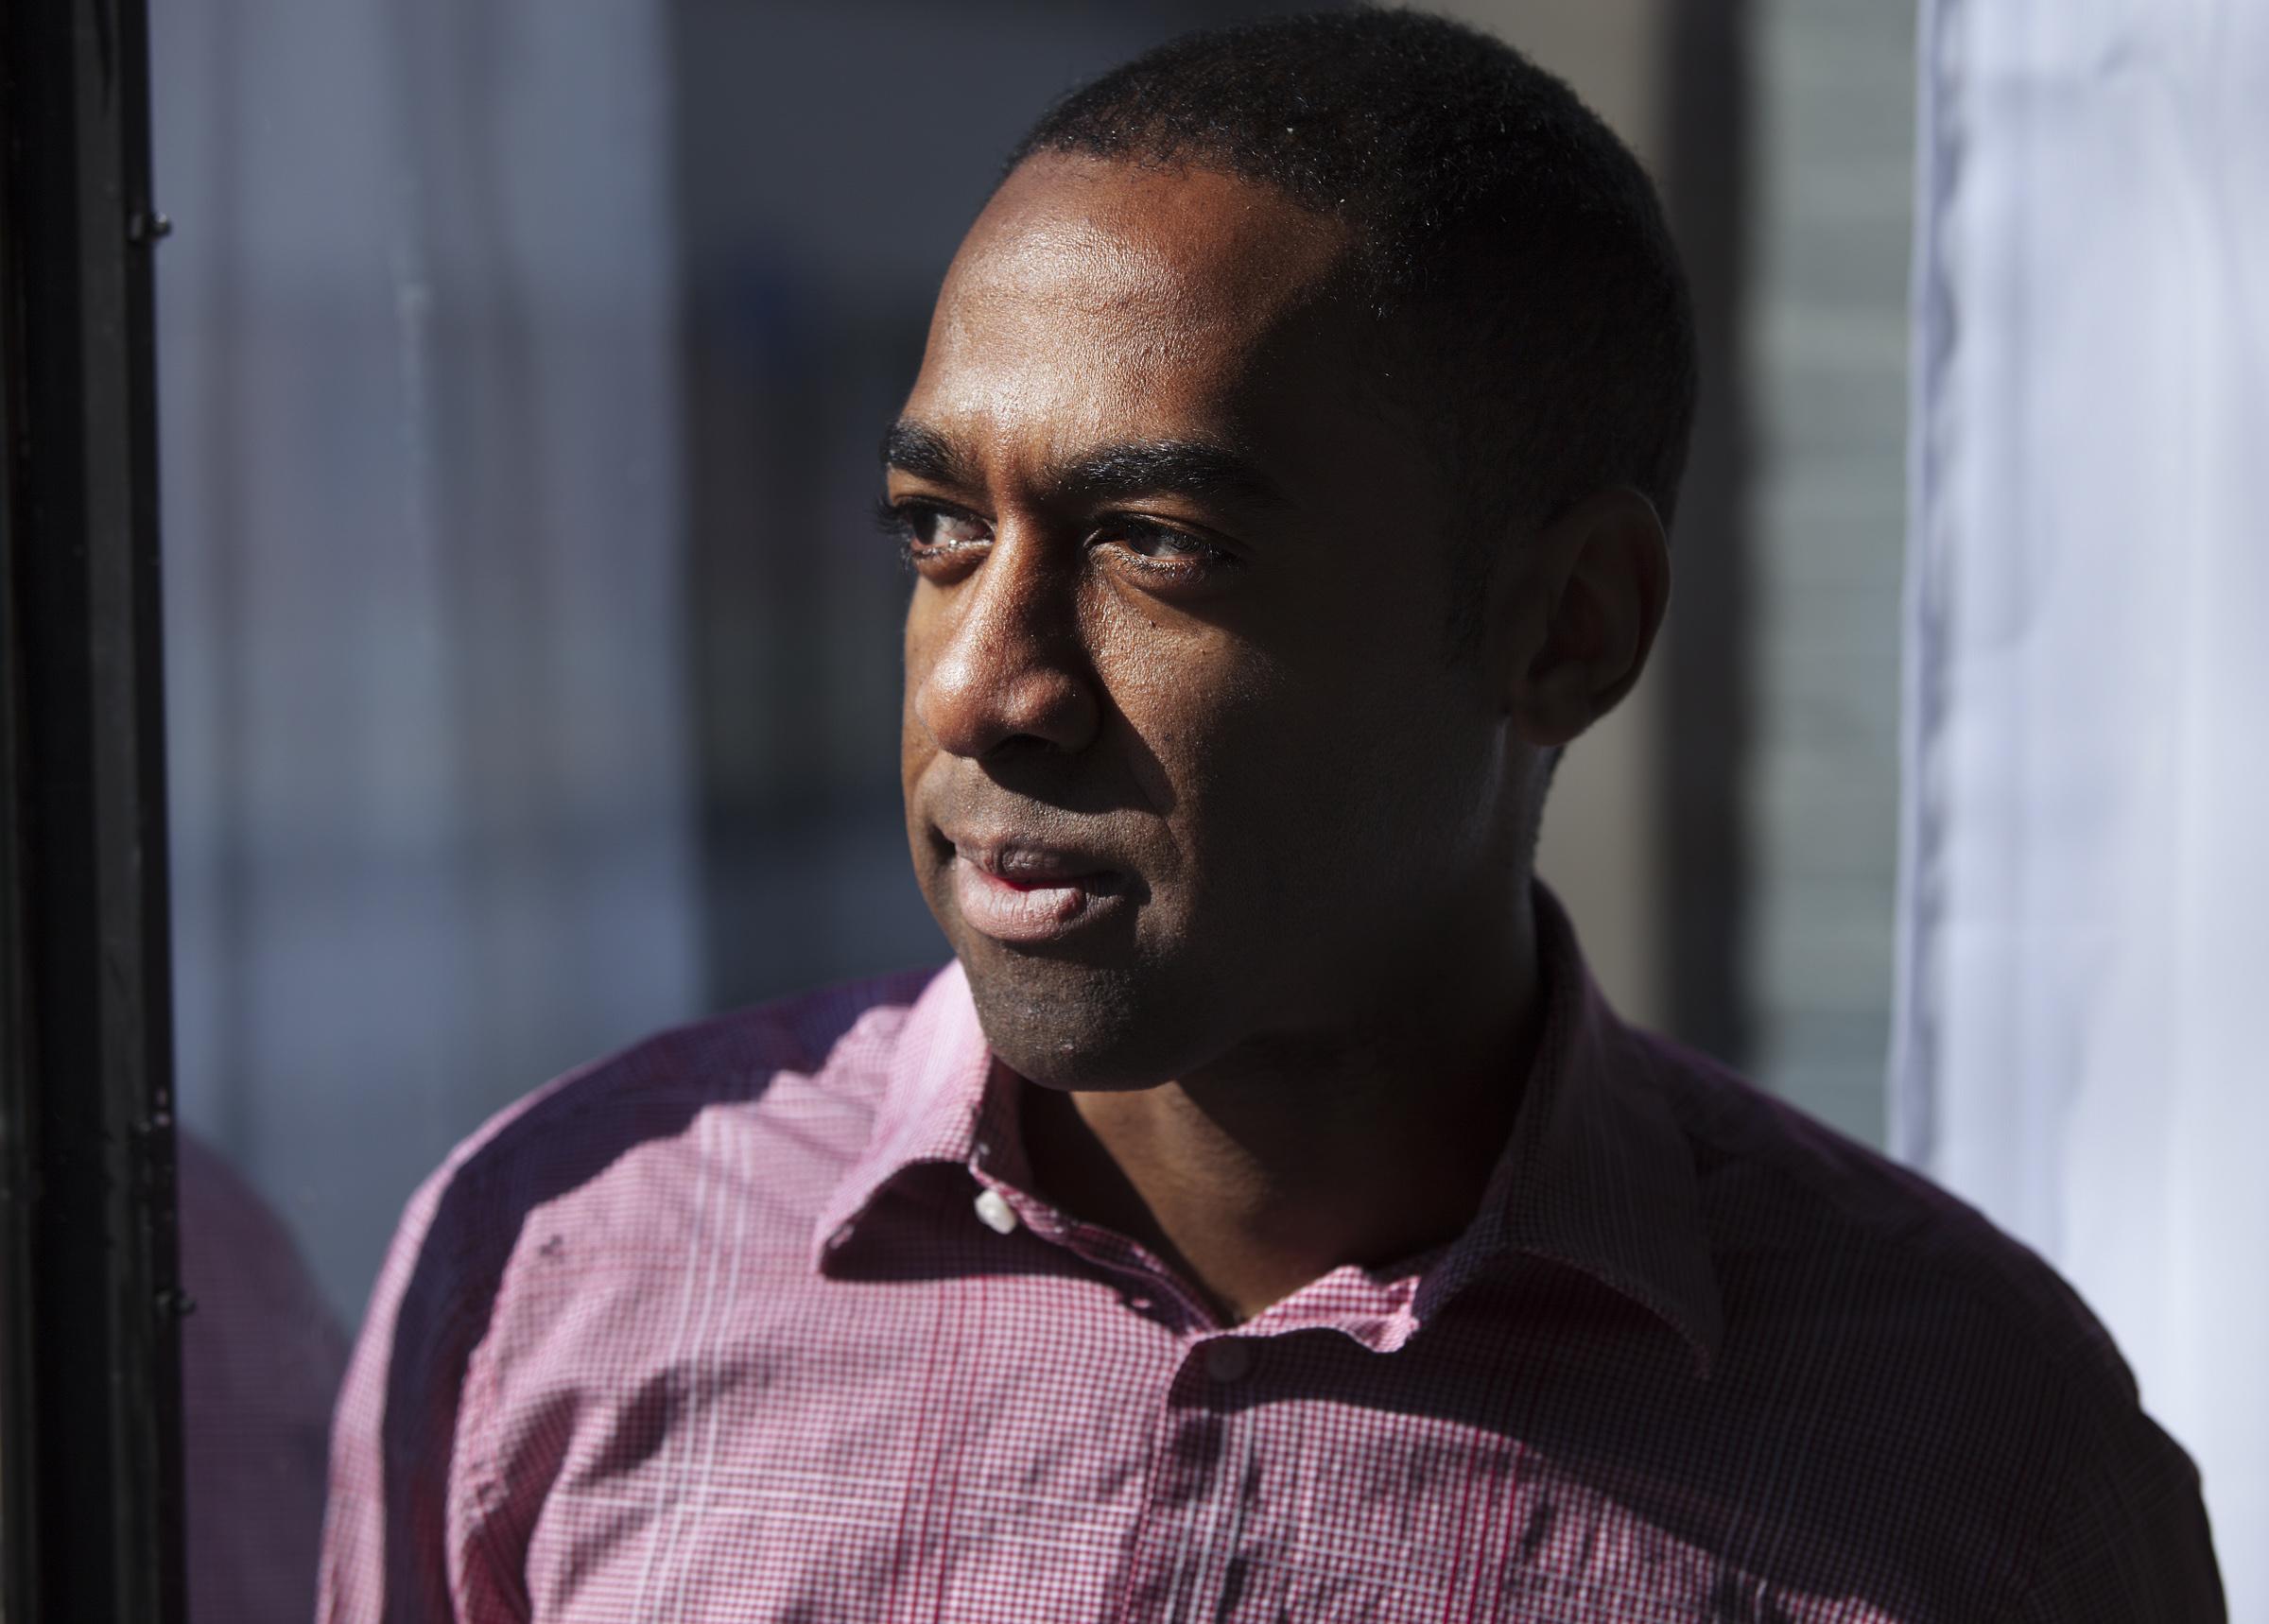 Ian Williams-Author, poet and Professor